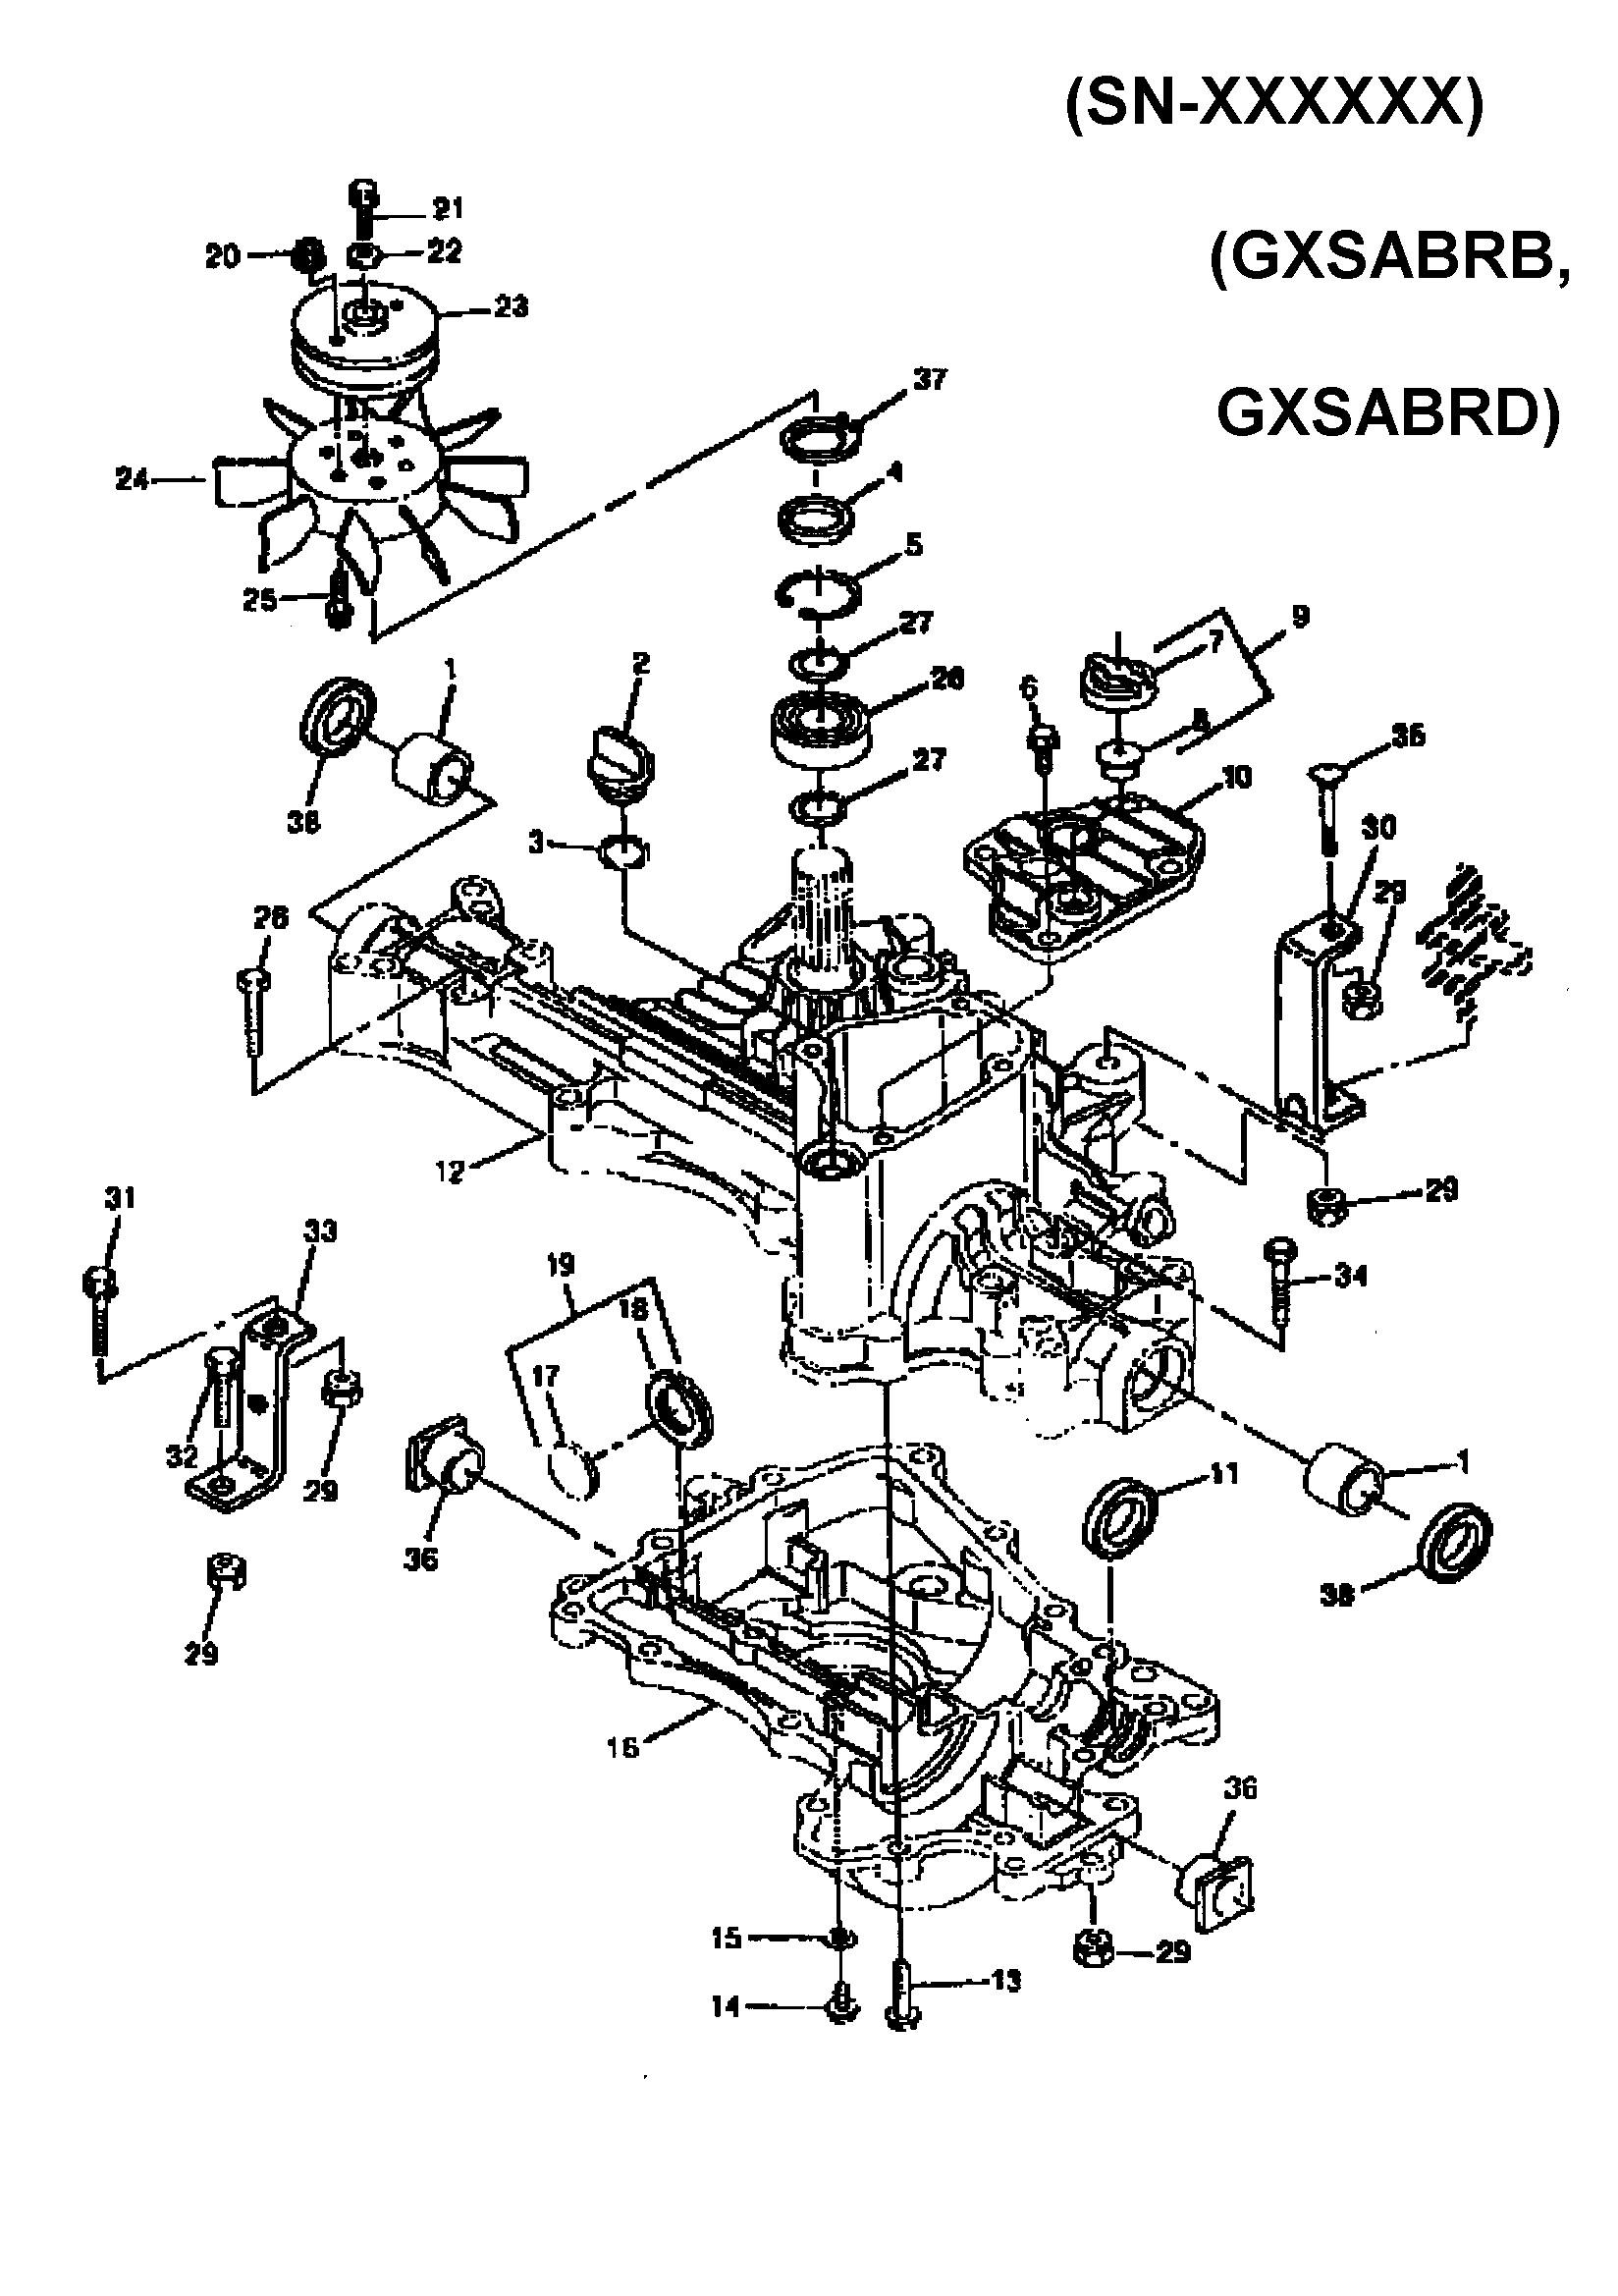 Tractor Engine Diagram Tractor Engine Parts Diagram John